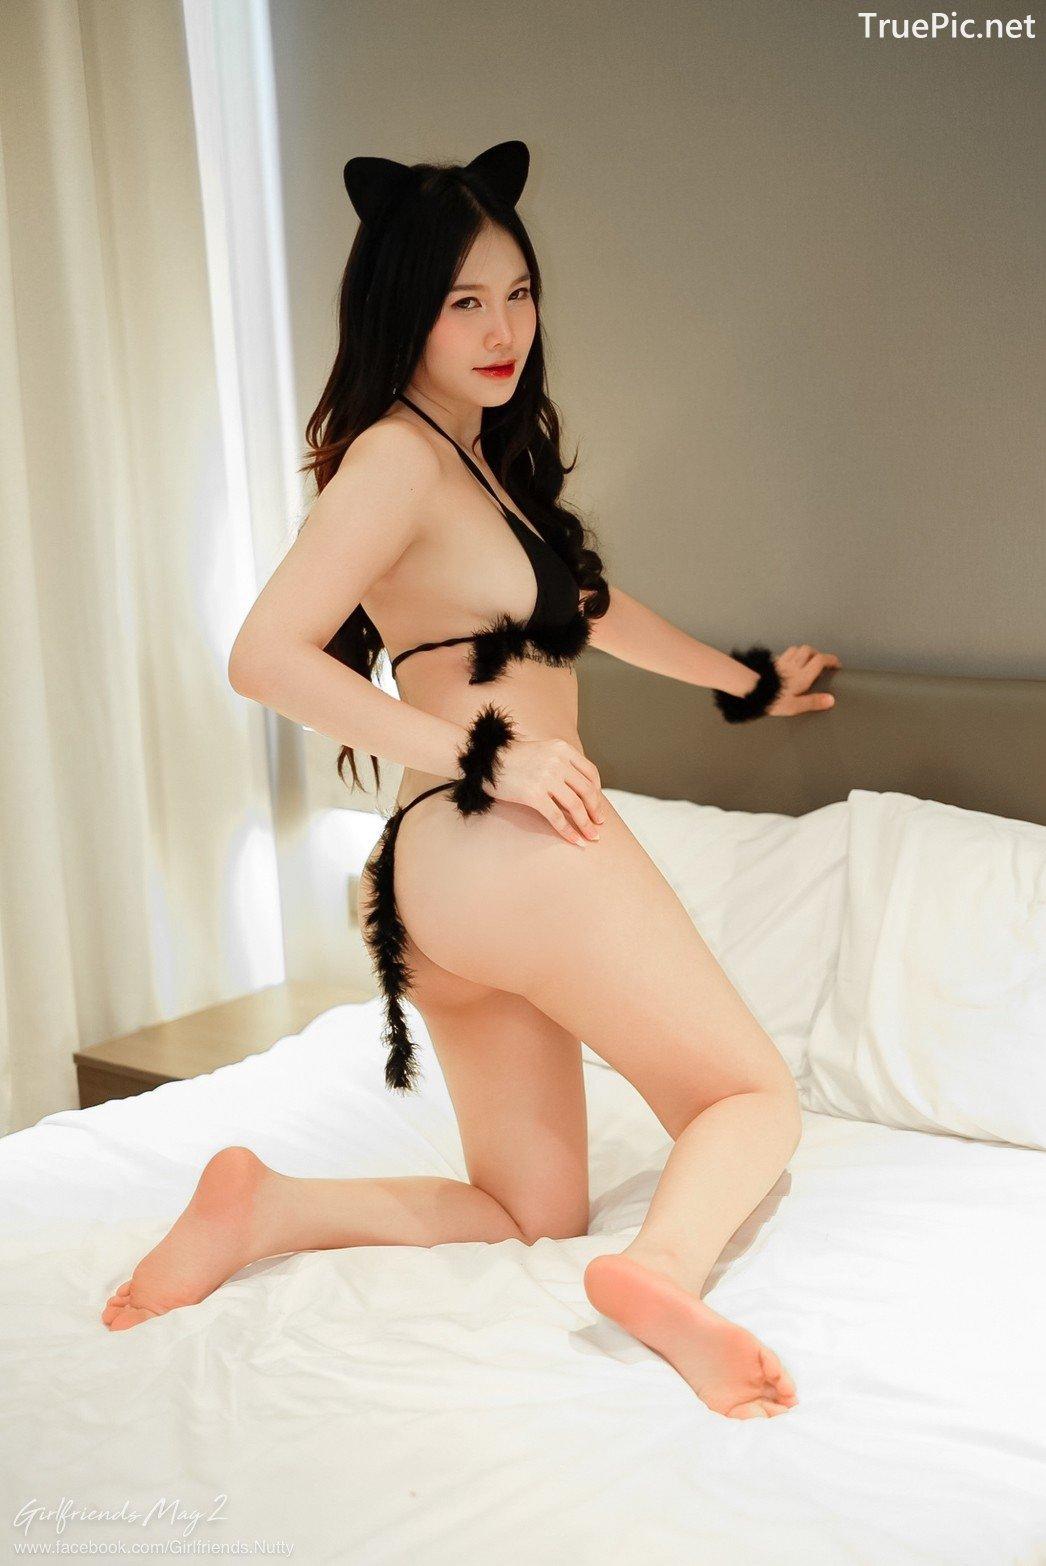 Image Thailand Model - Chanunshida Phuangsombut - Sexy Black Cat - TruePic.net - Picture-6